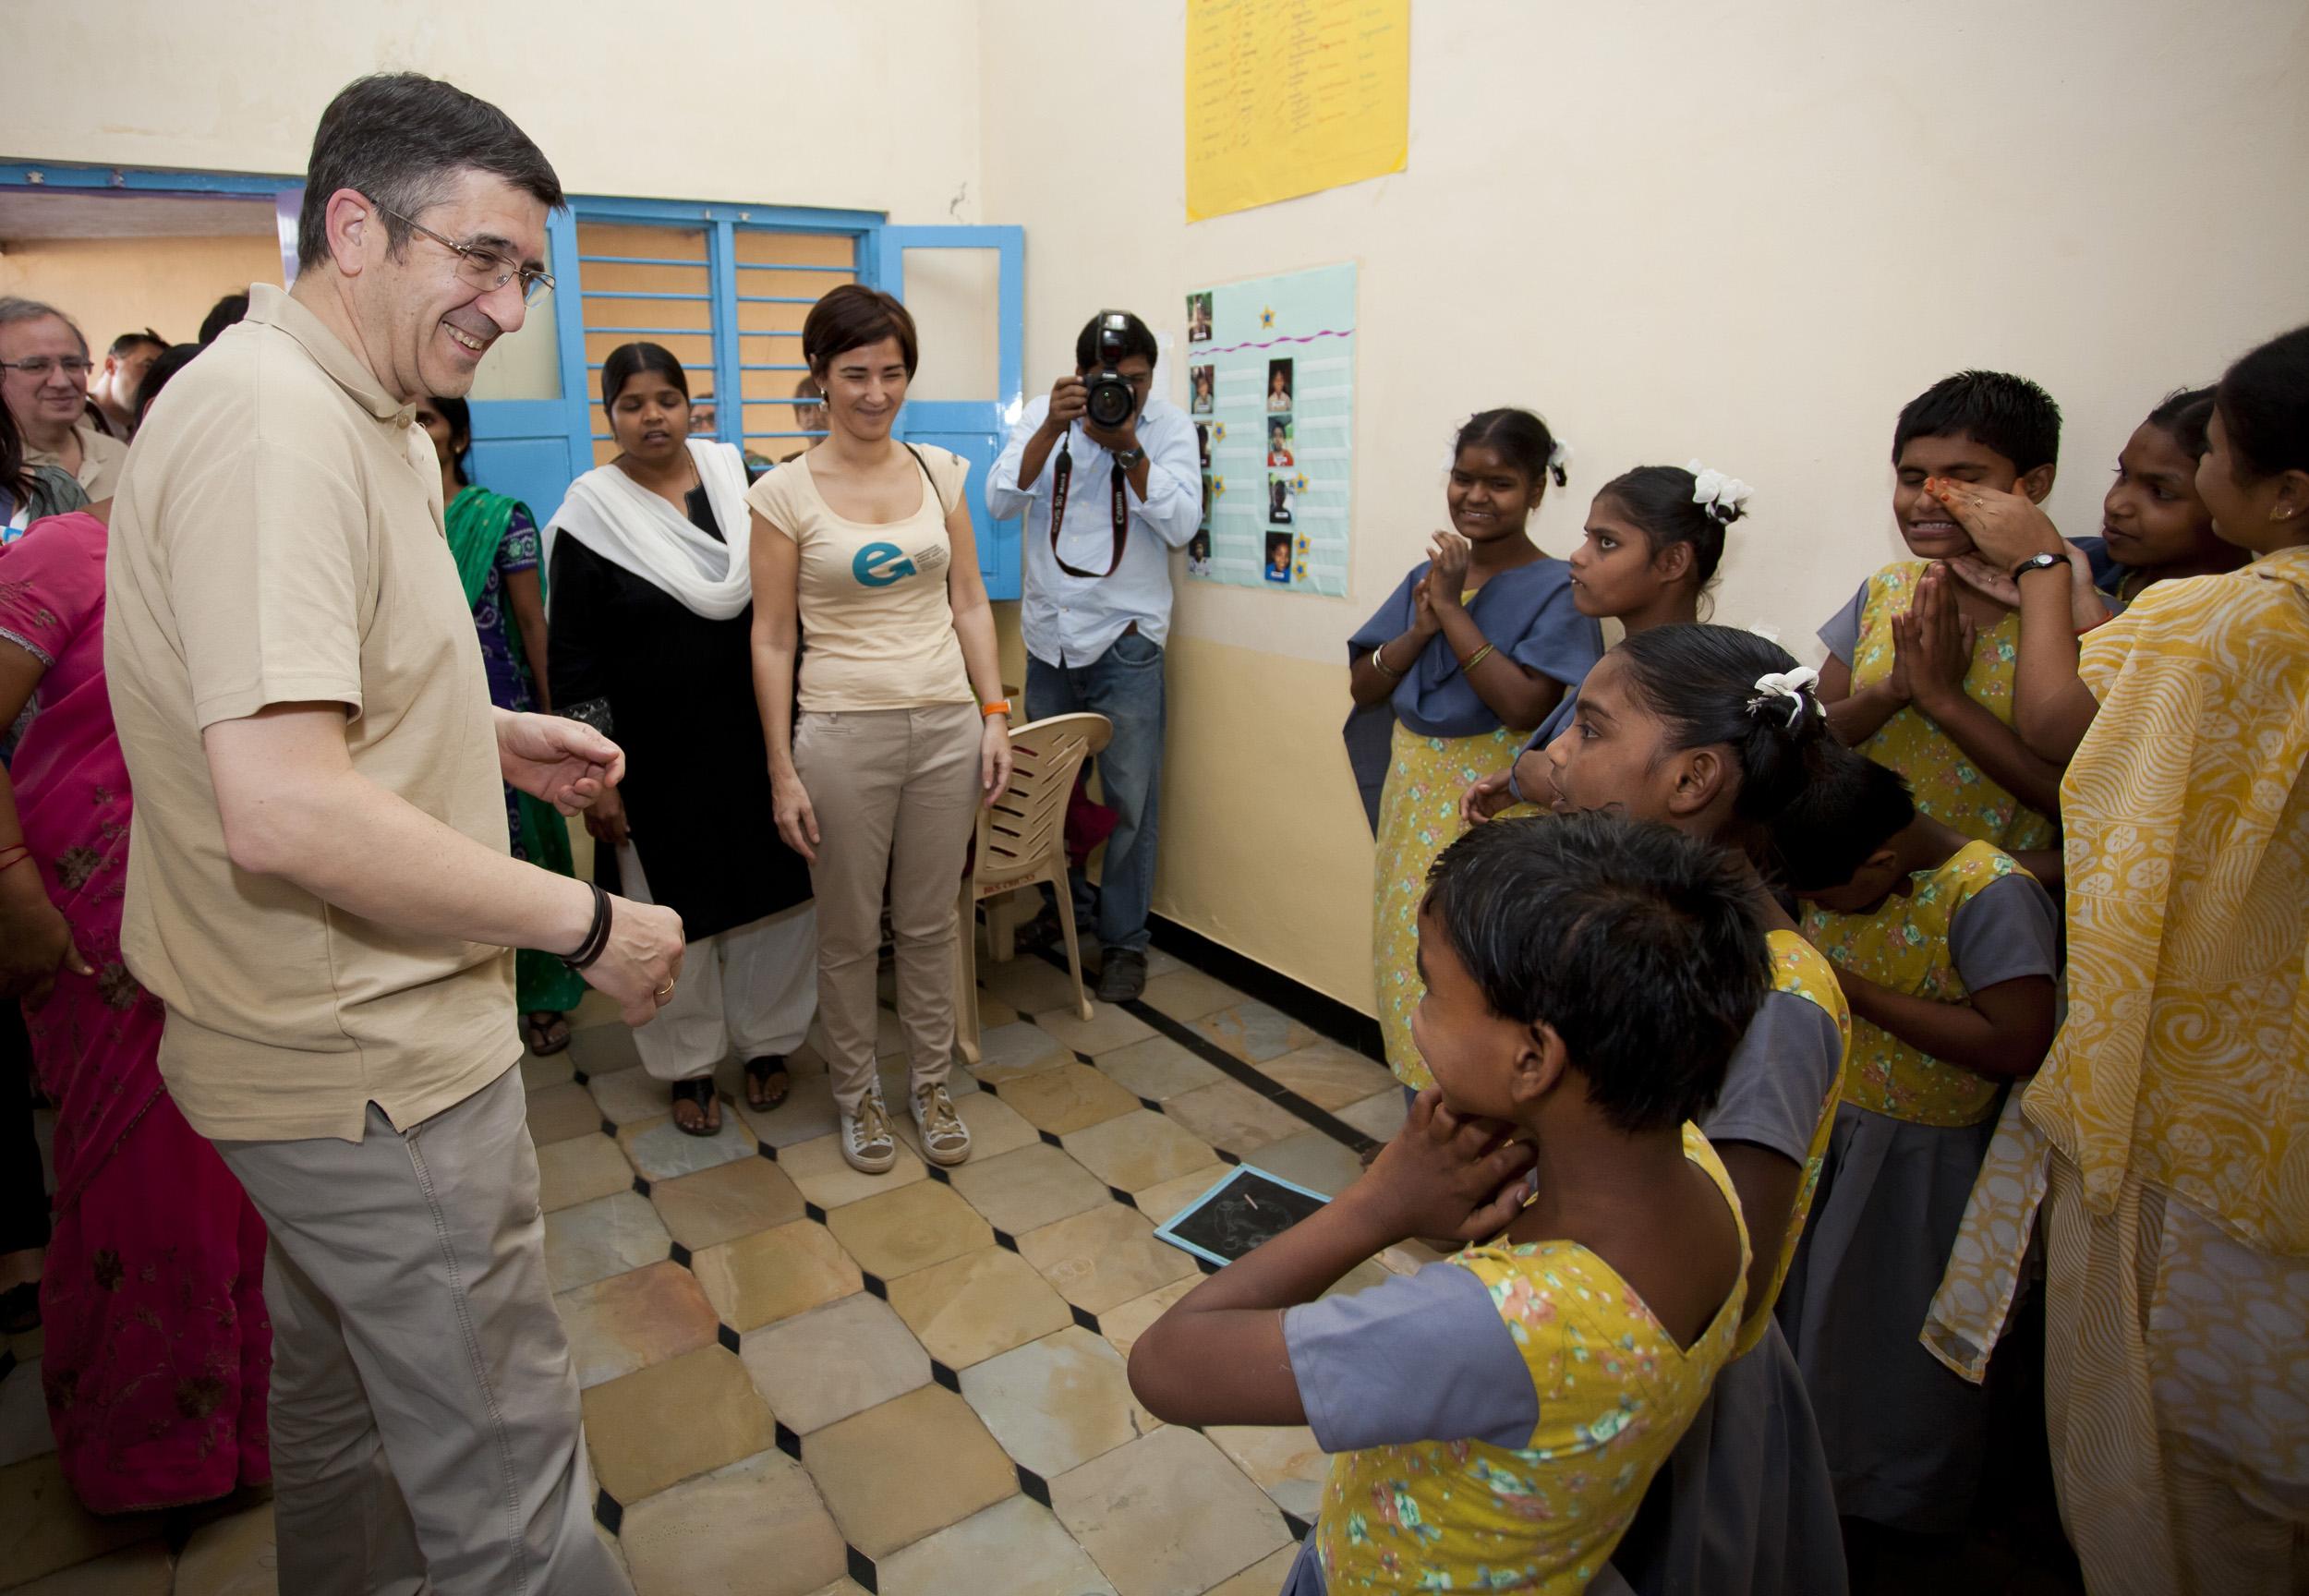 2012_03_17_vicente_ferrer_escuelas01.jpg